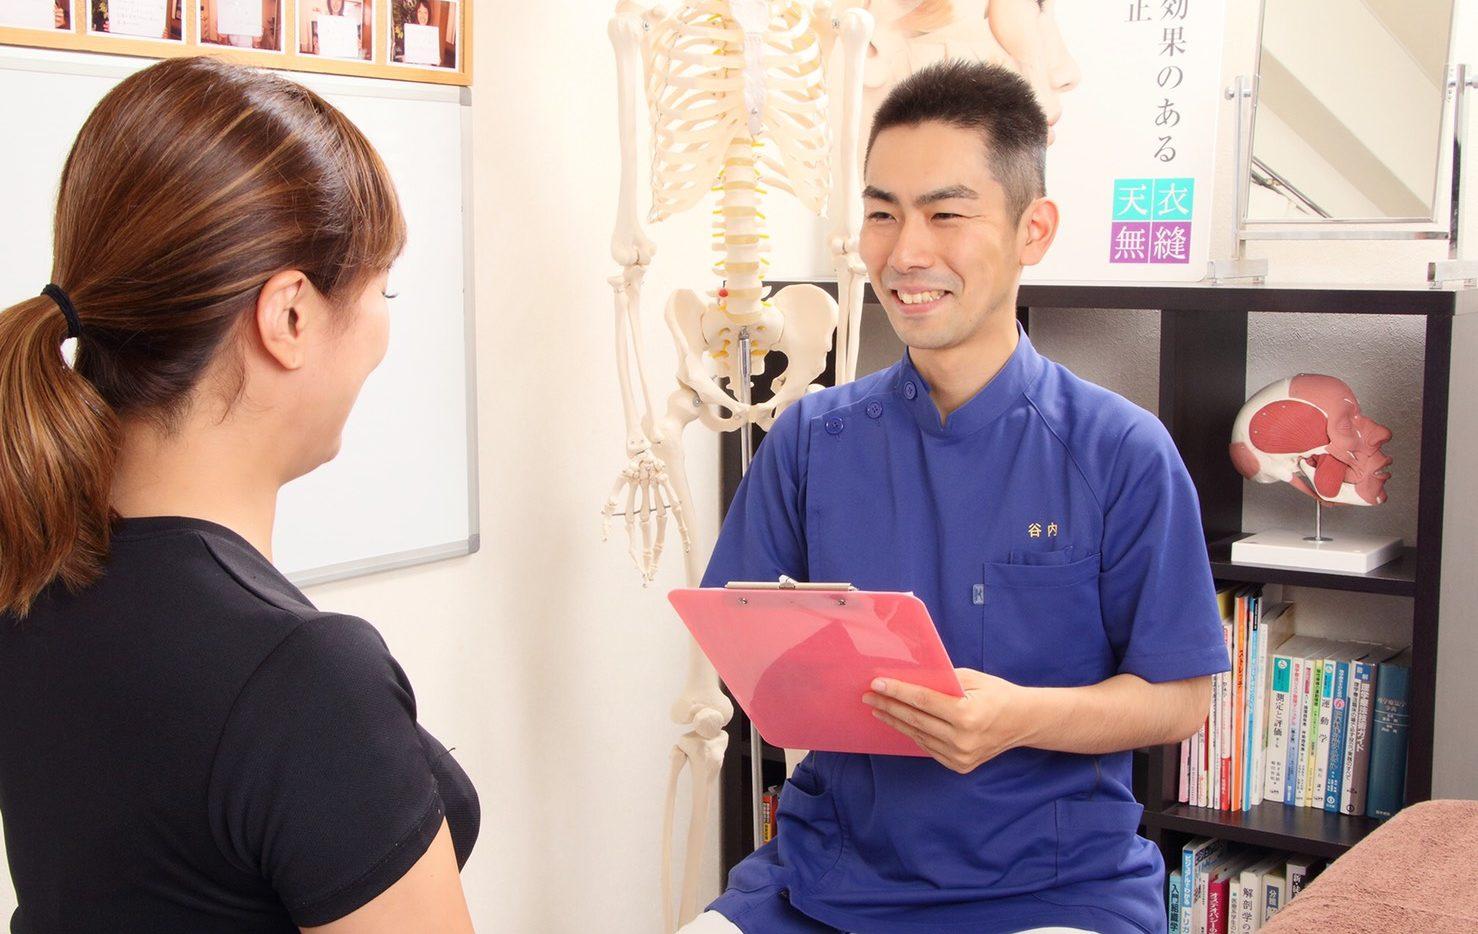 #8 Youtube登録者数8万人の理学療法士が英語パーソナルトレーニングを薦める理由